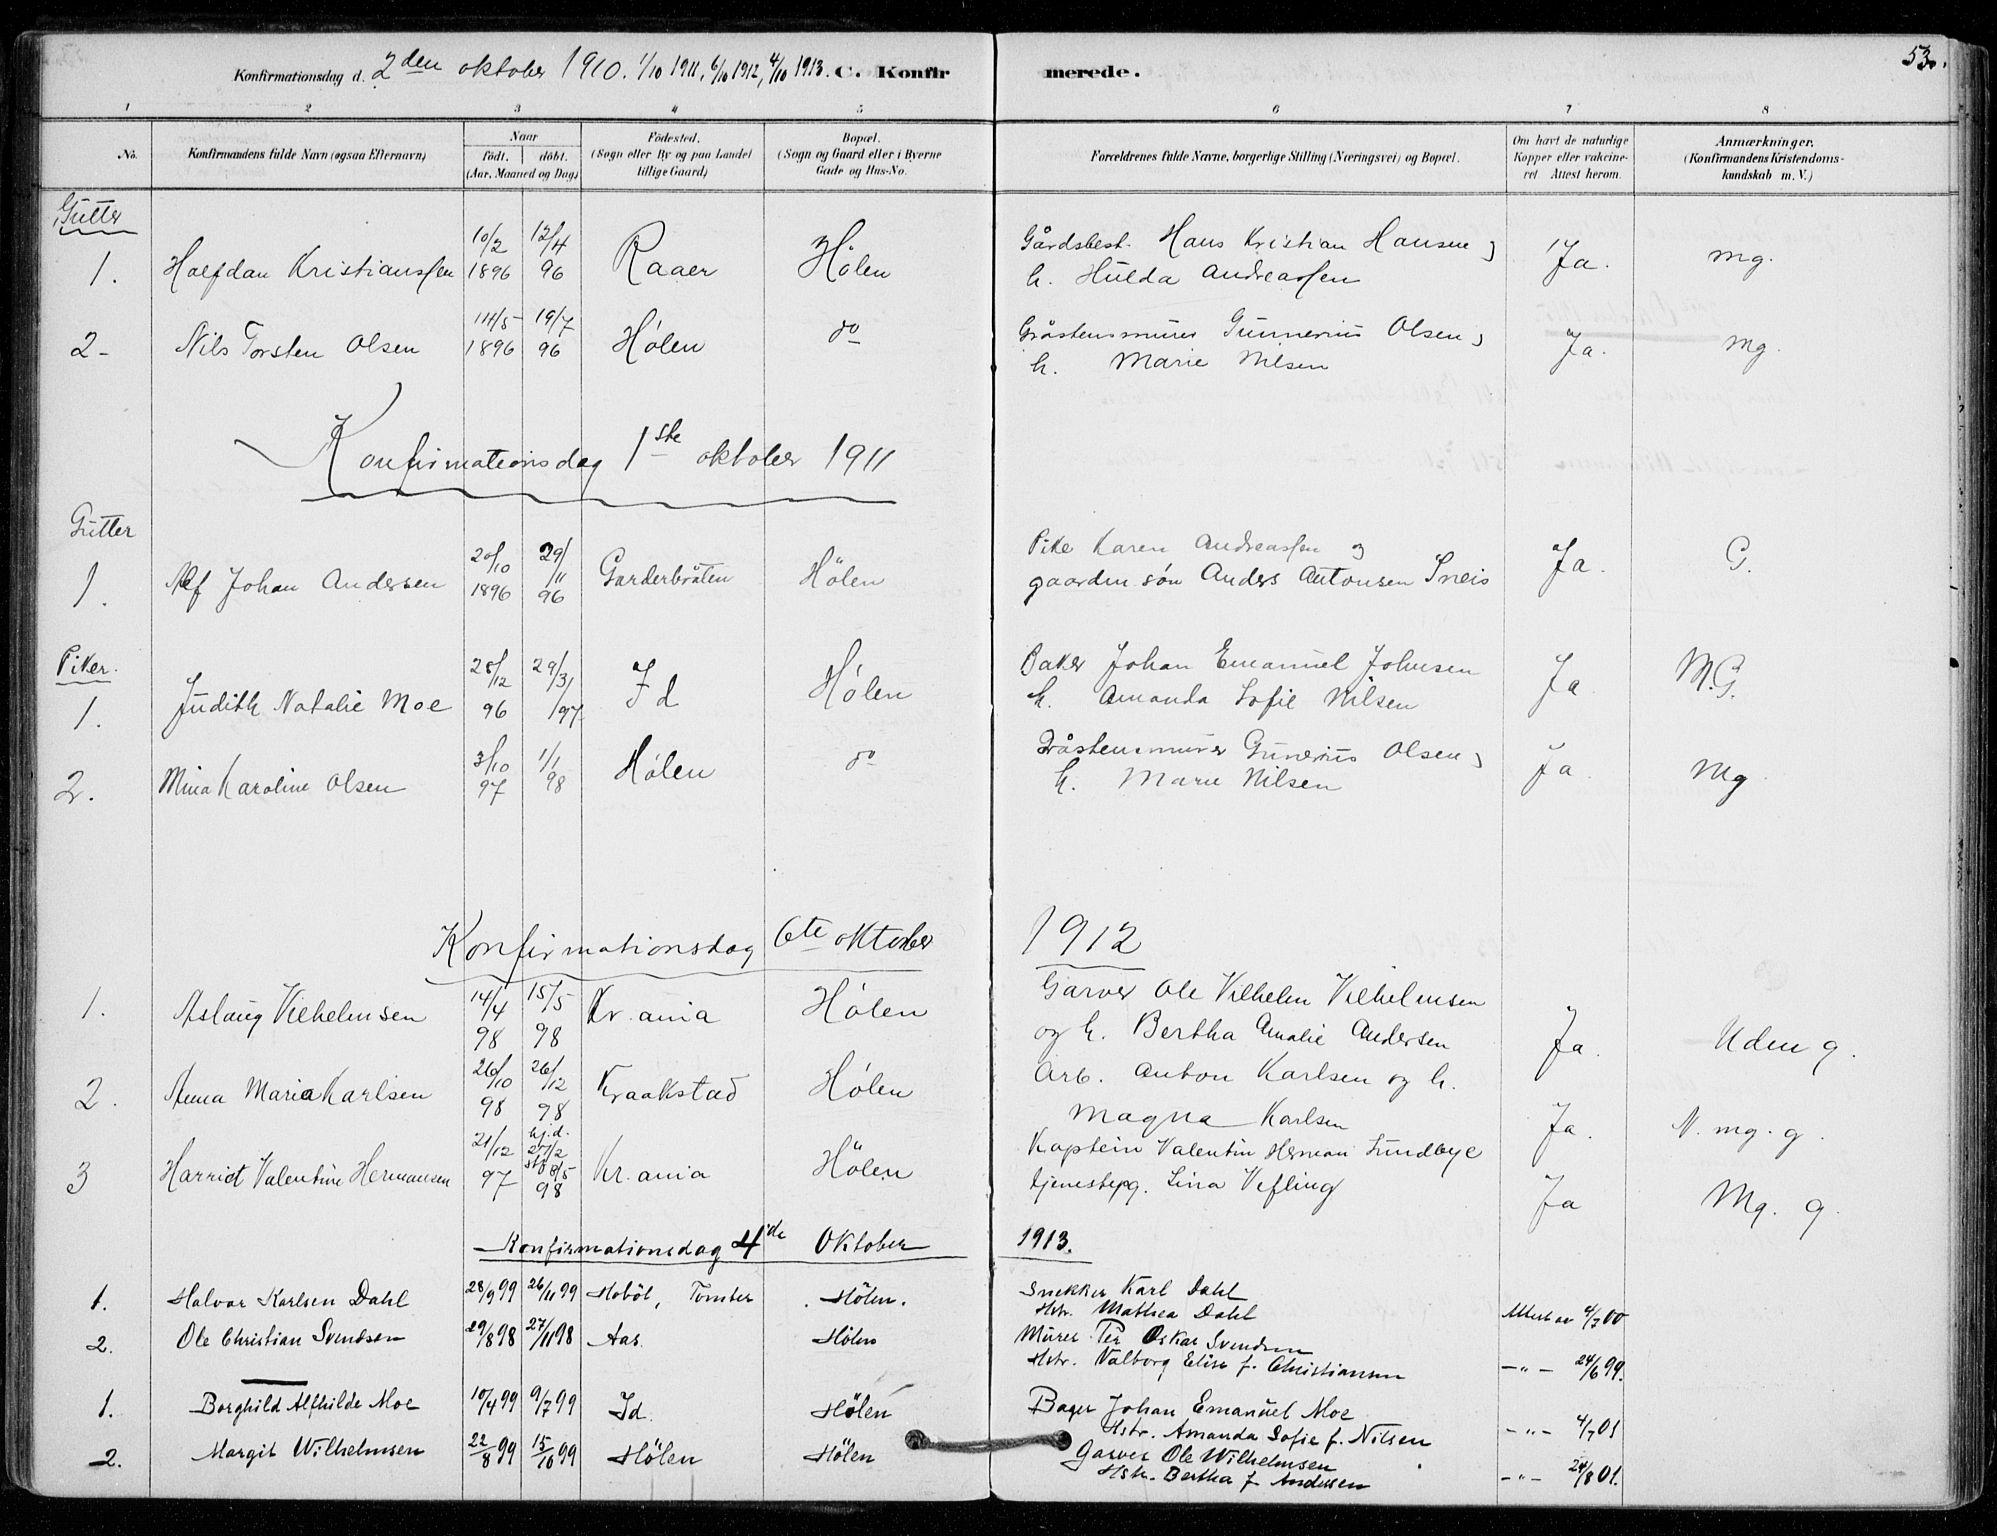 SAO, Vestby prestekontor Kirkebøker, F/Fe/L0001: Ministerialbok nr. V 1, 1878-1931, s. 53